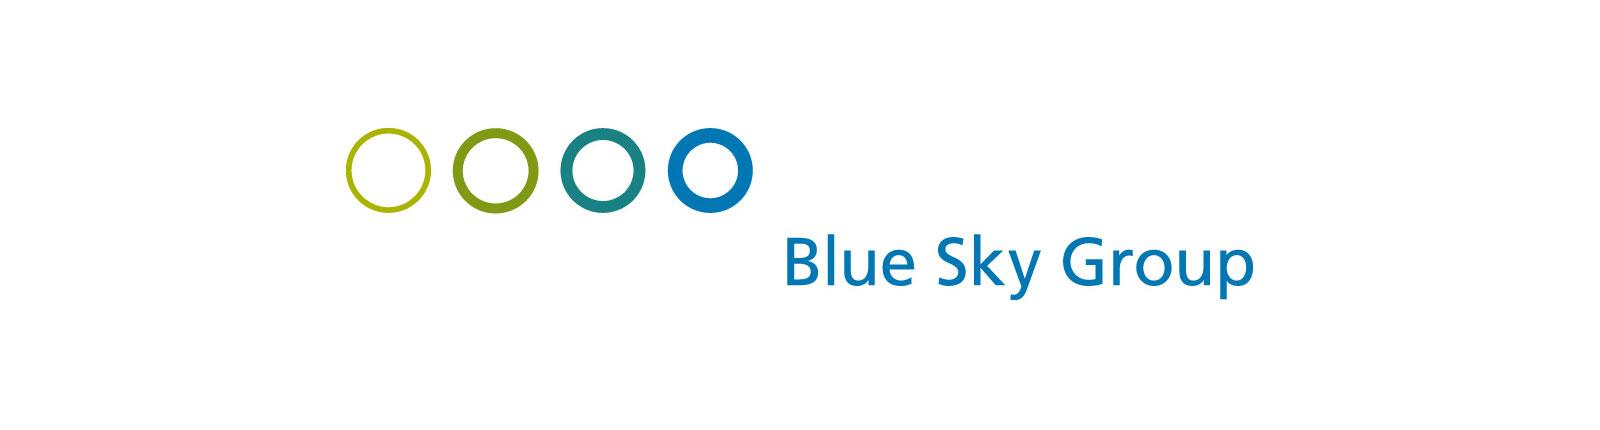 BSG_Logo_fc